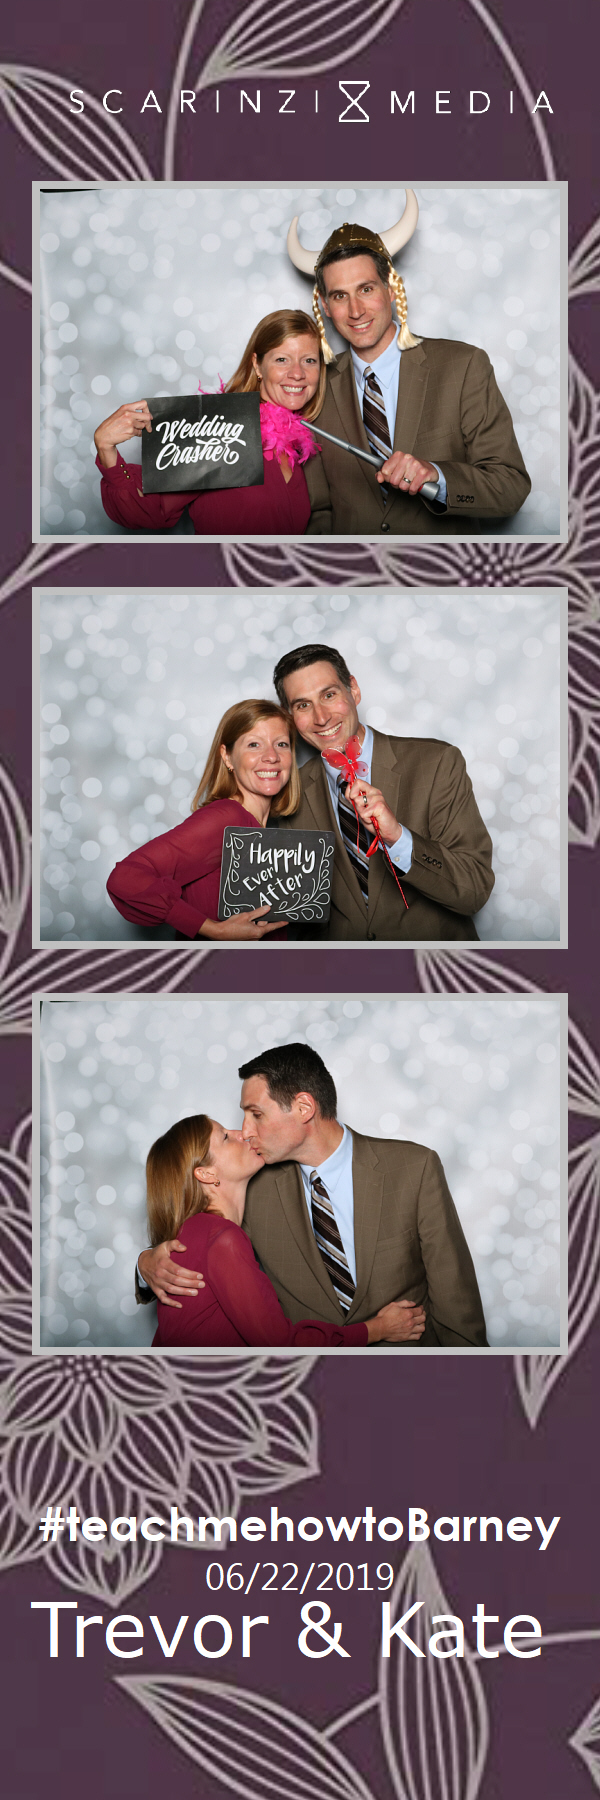 2019.06.22 - Barney Wedding PHOTOBOOTH23.jpg